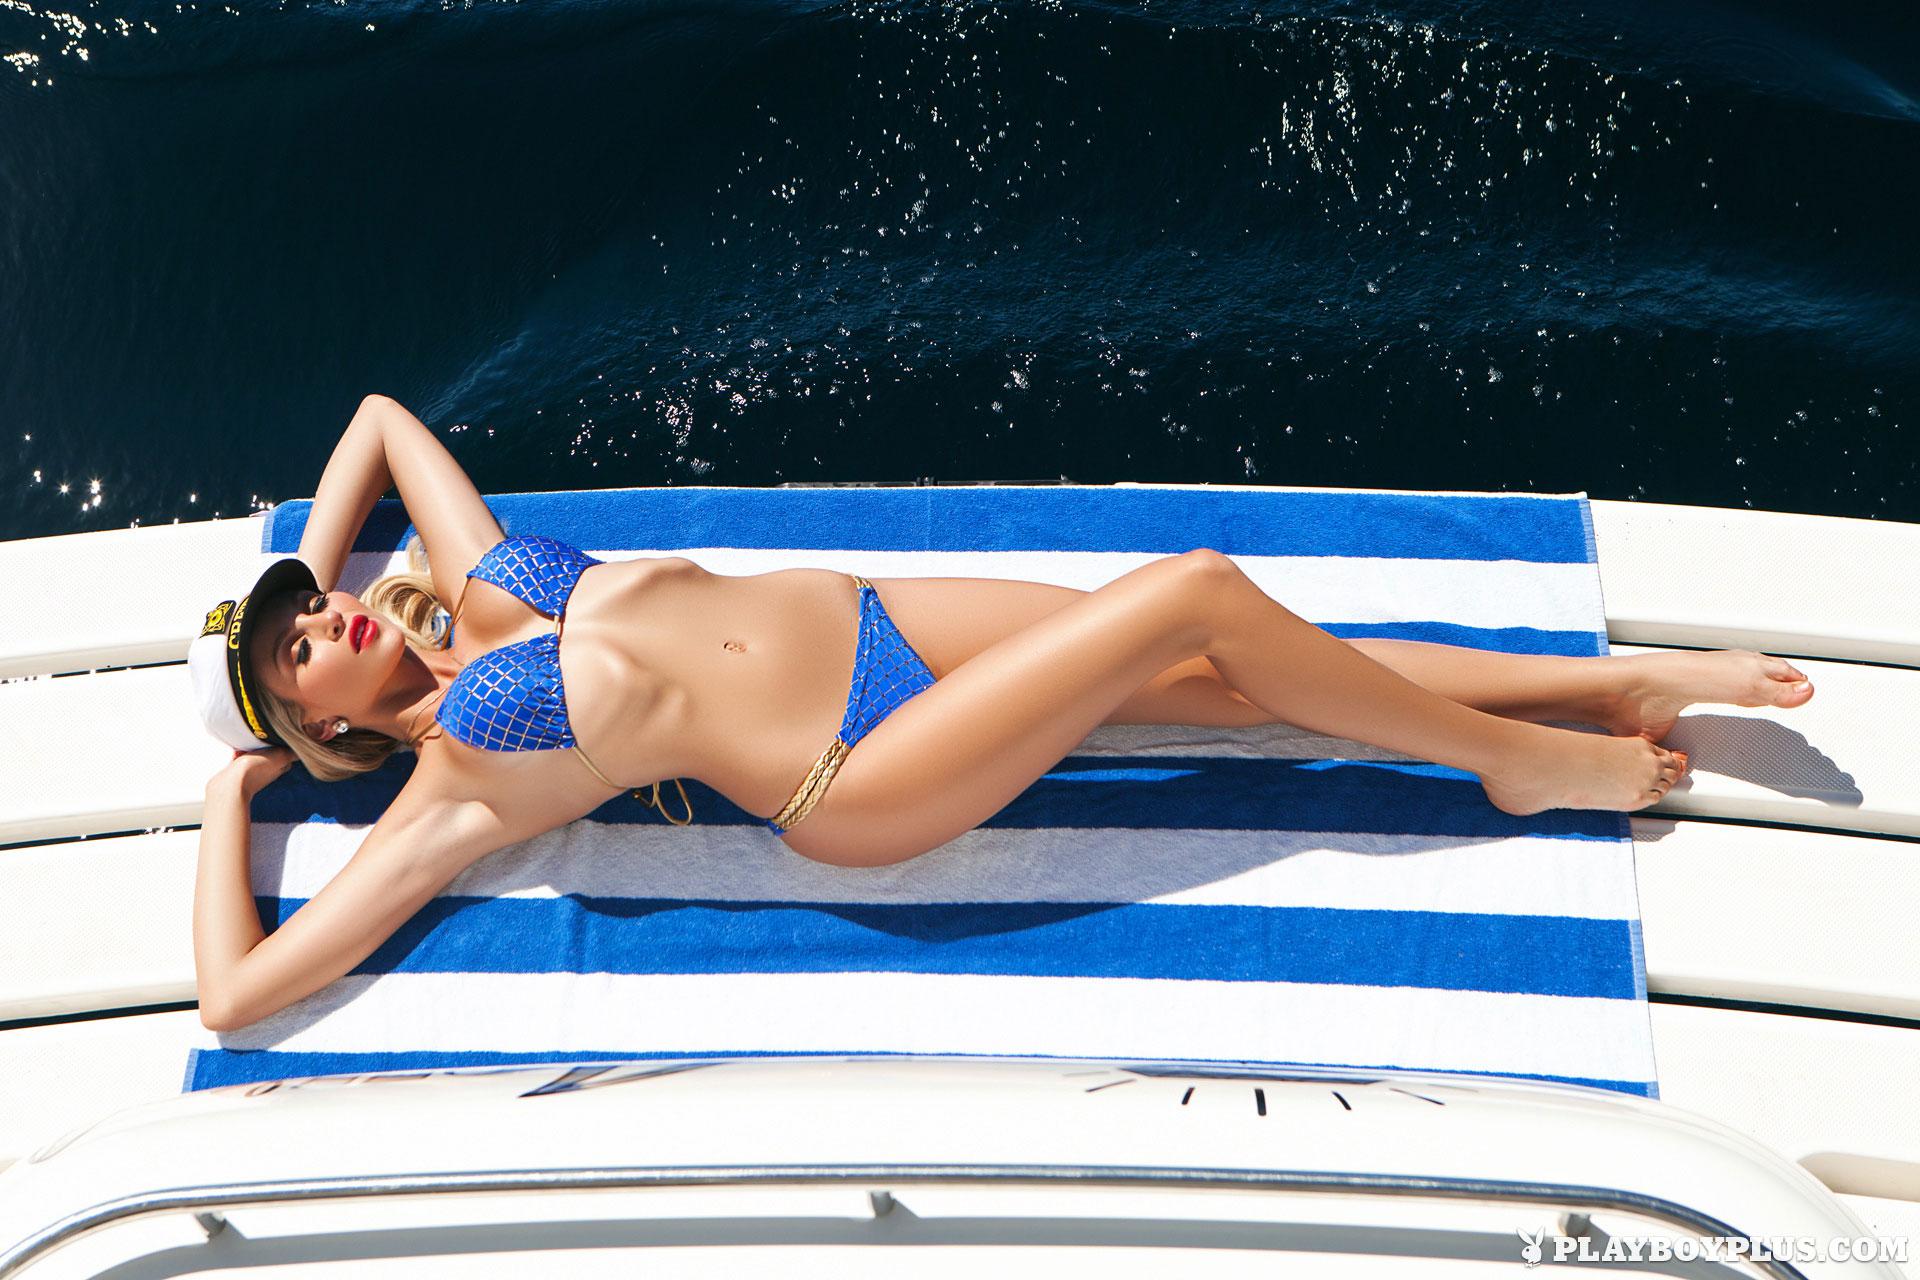 khloe-terae-captain-nude-boat-playboy-05